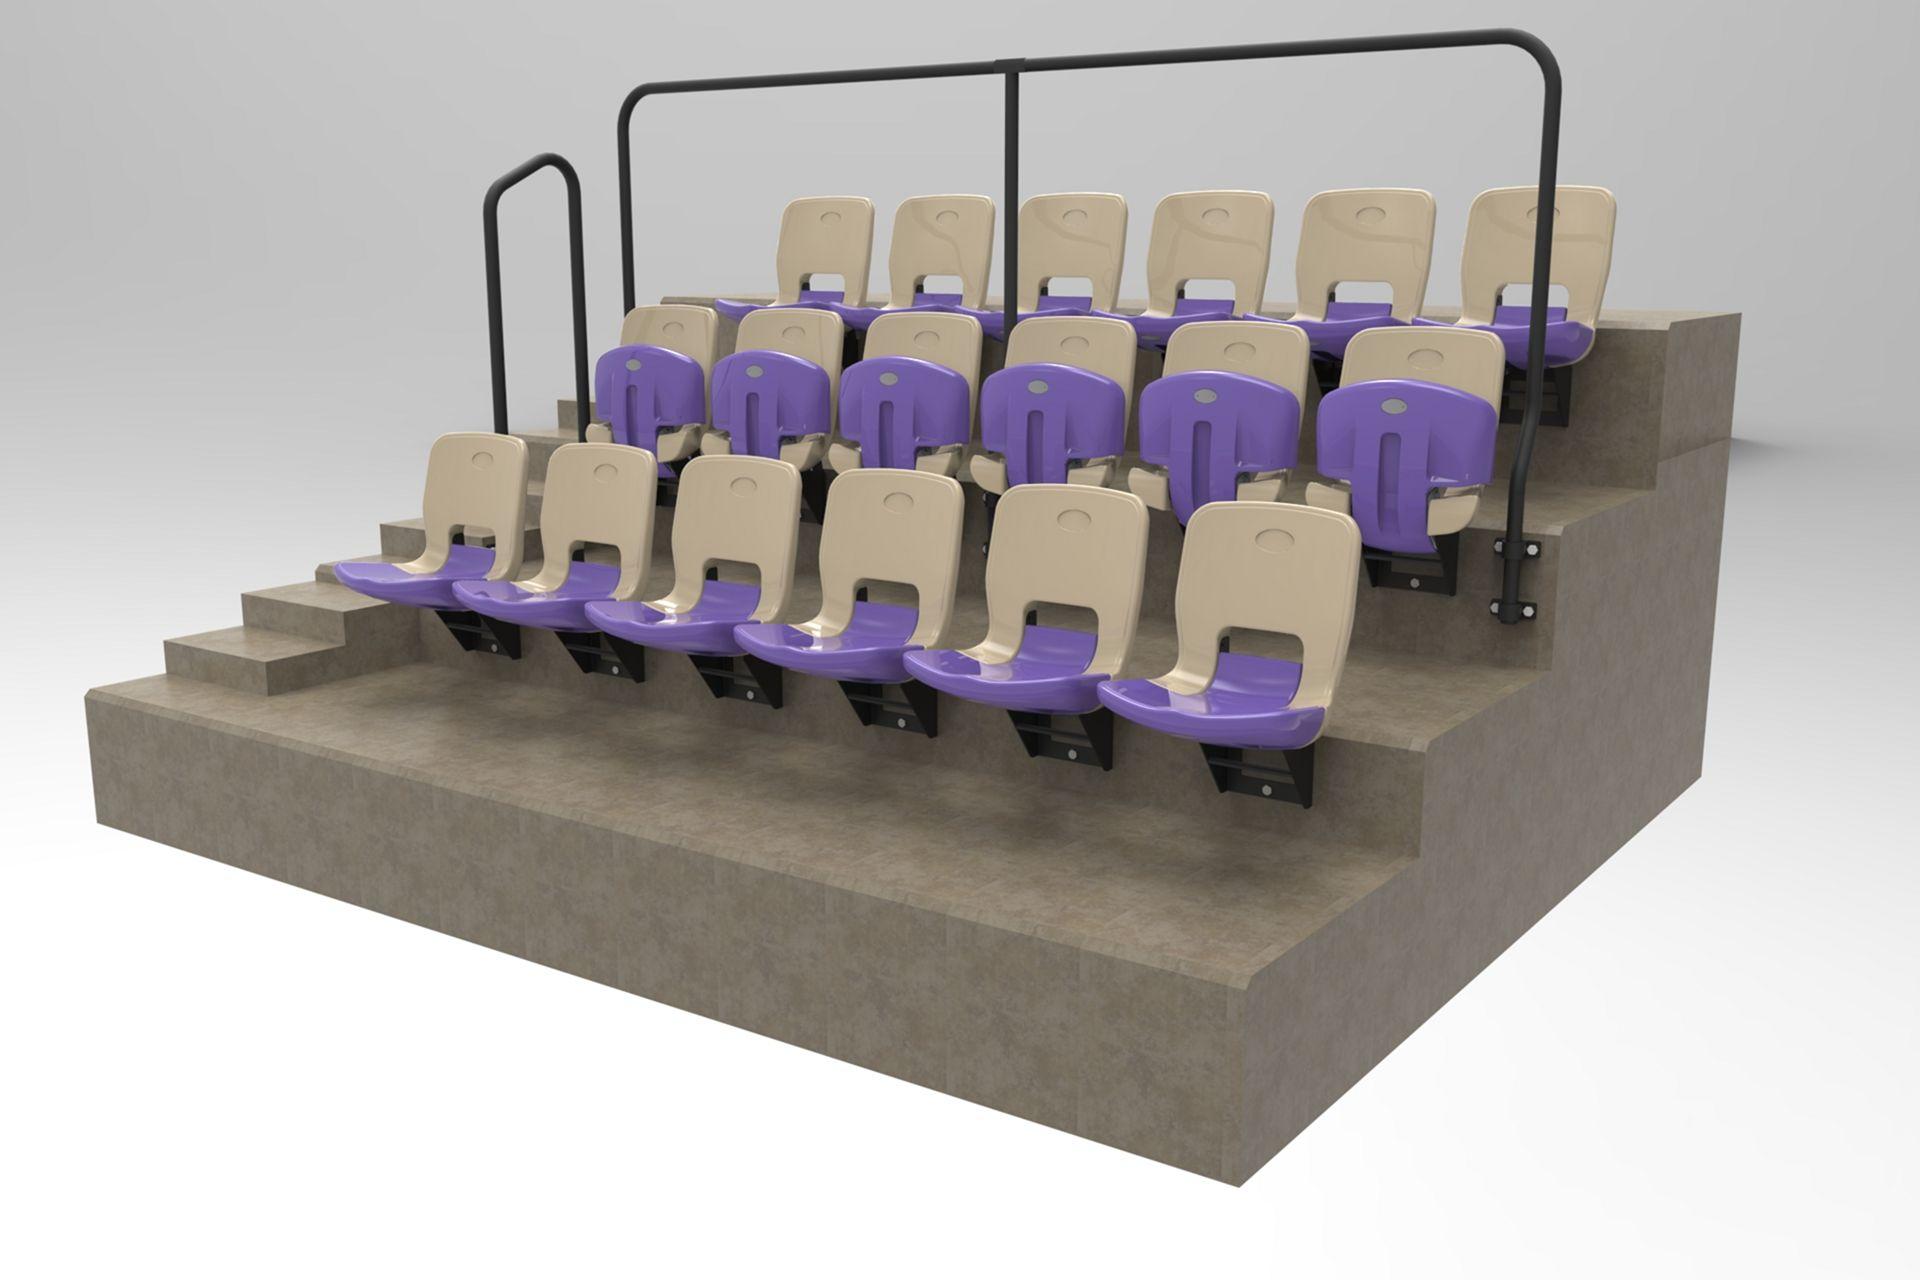 linea_backrest_monoblock_copolymer_pp_stadium_chair_seatorium_53